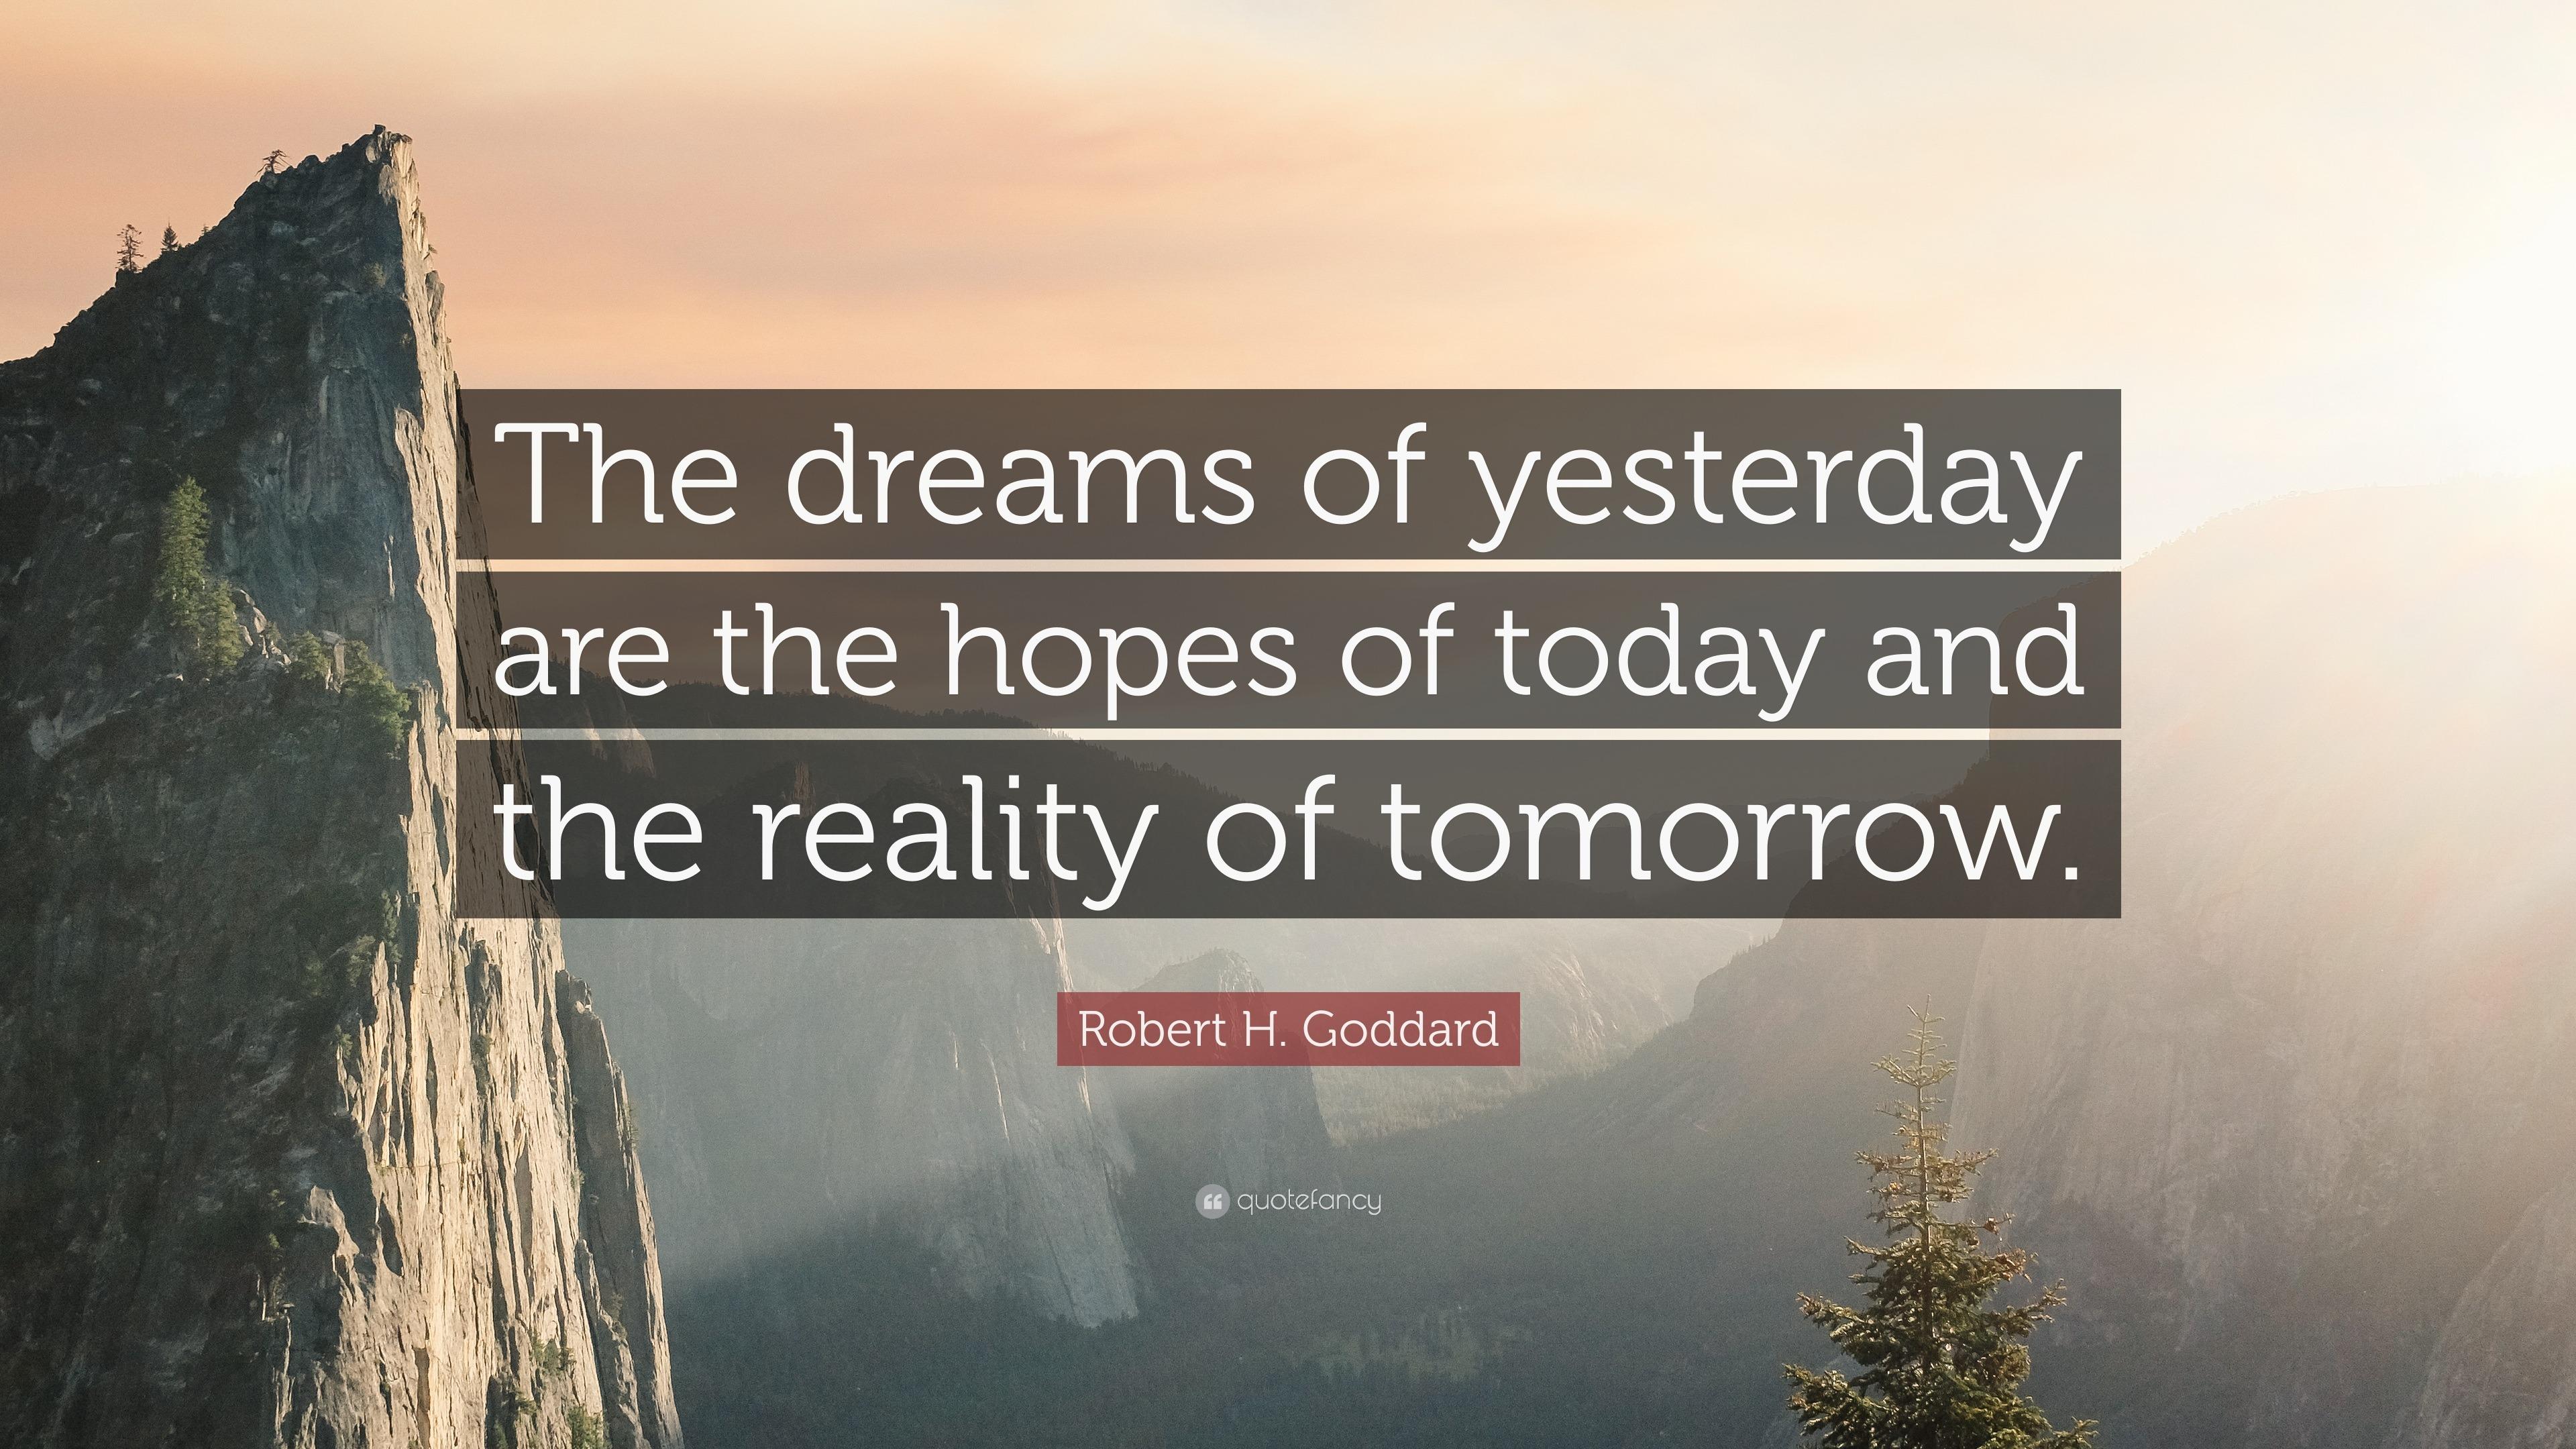 Robert H. Goddard Quotes (4 Wallpapers)